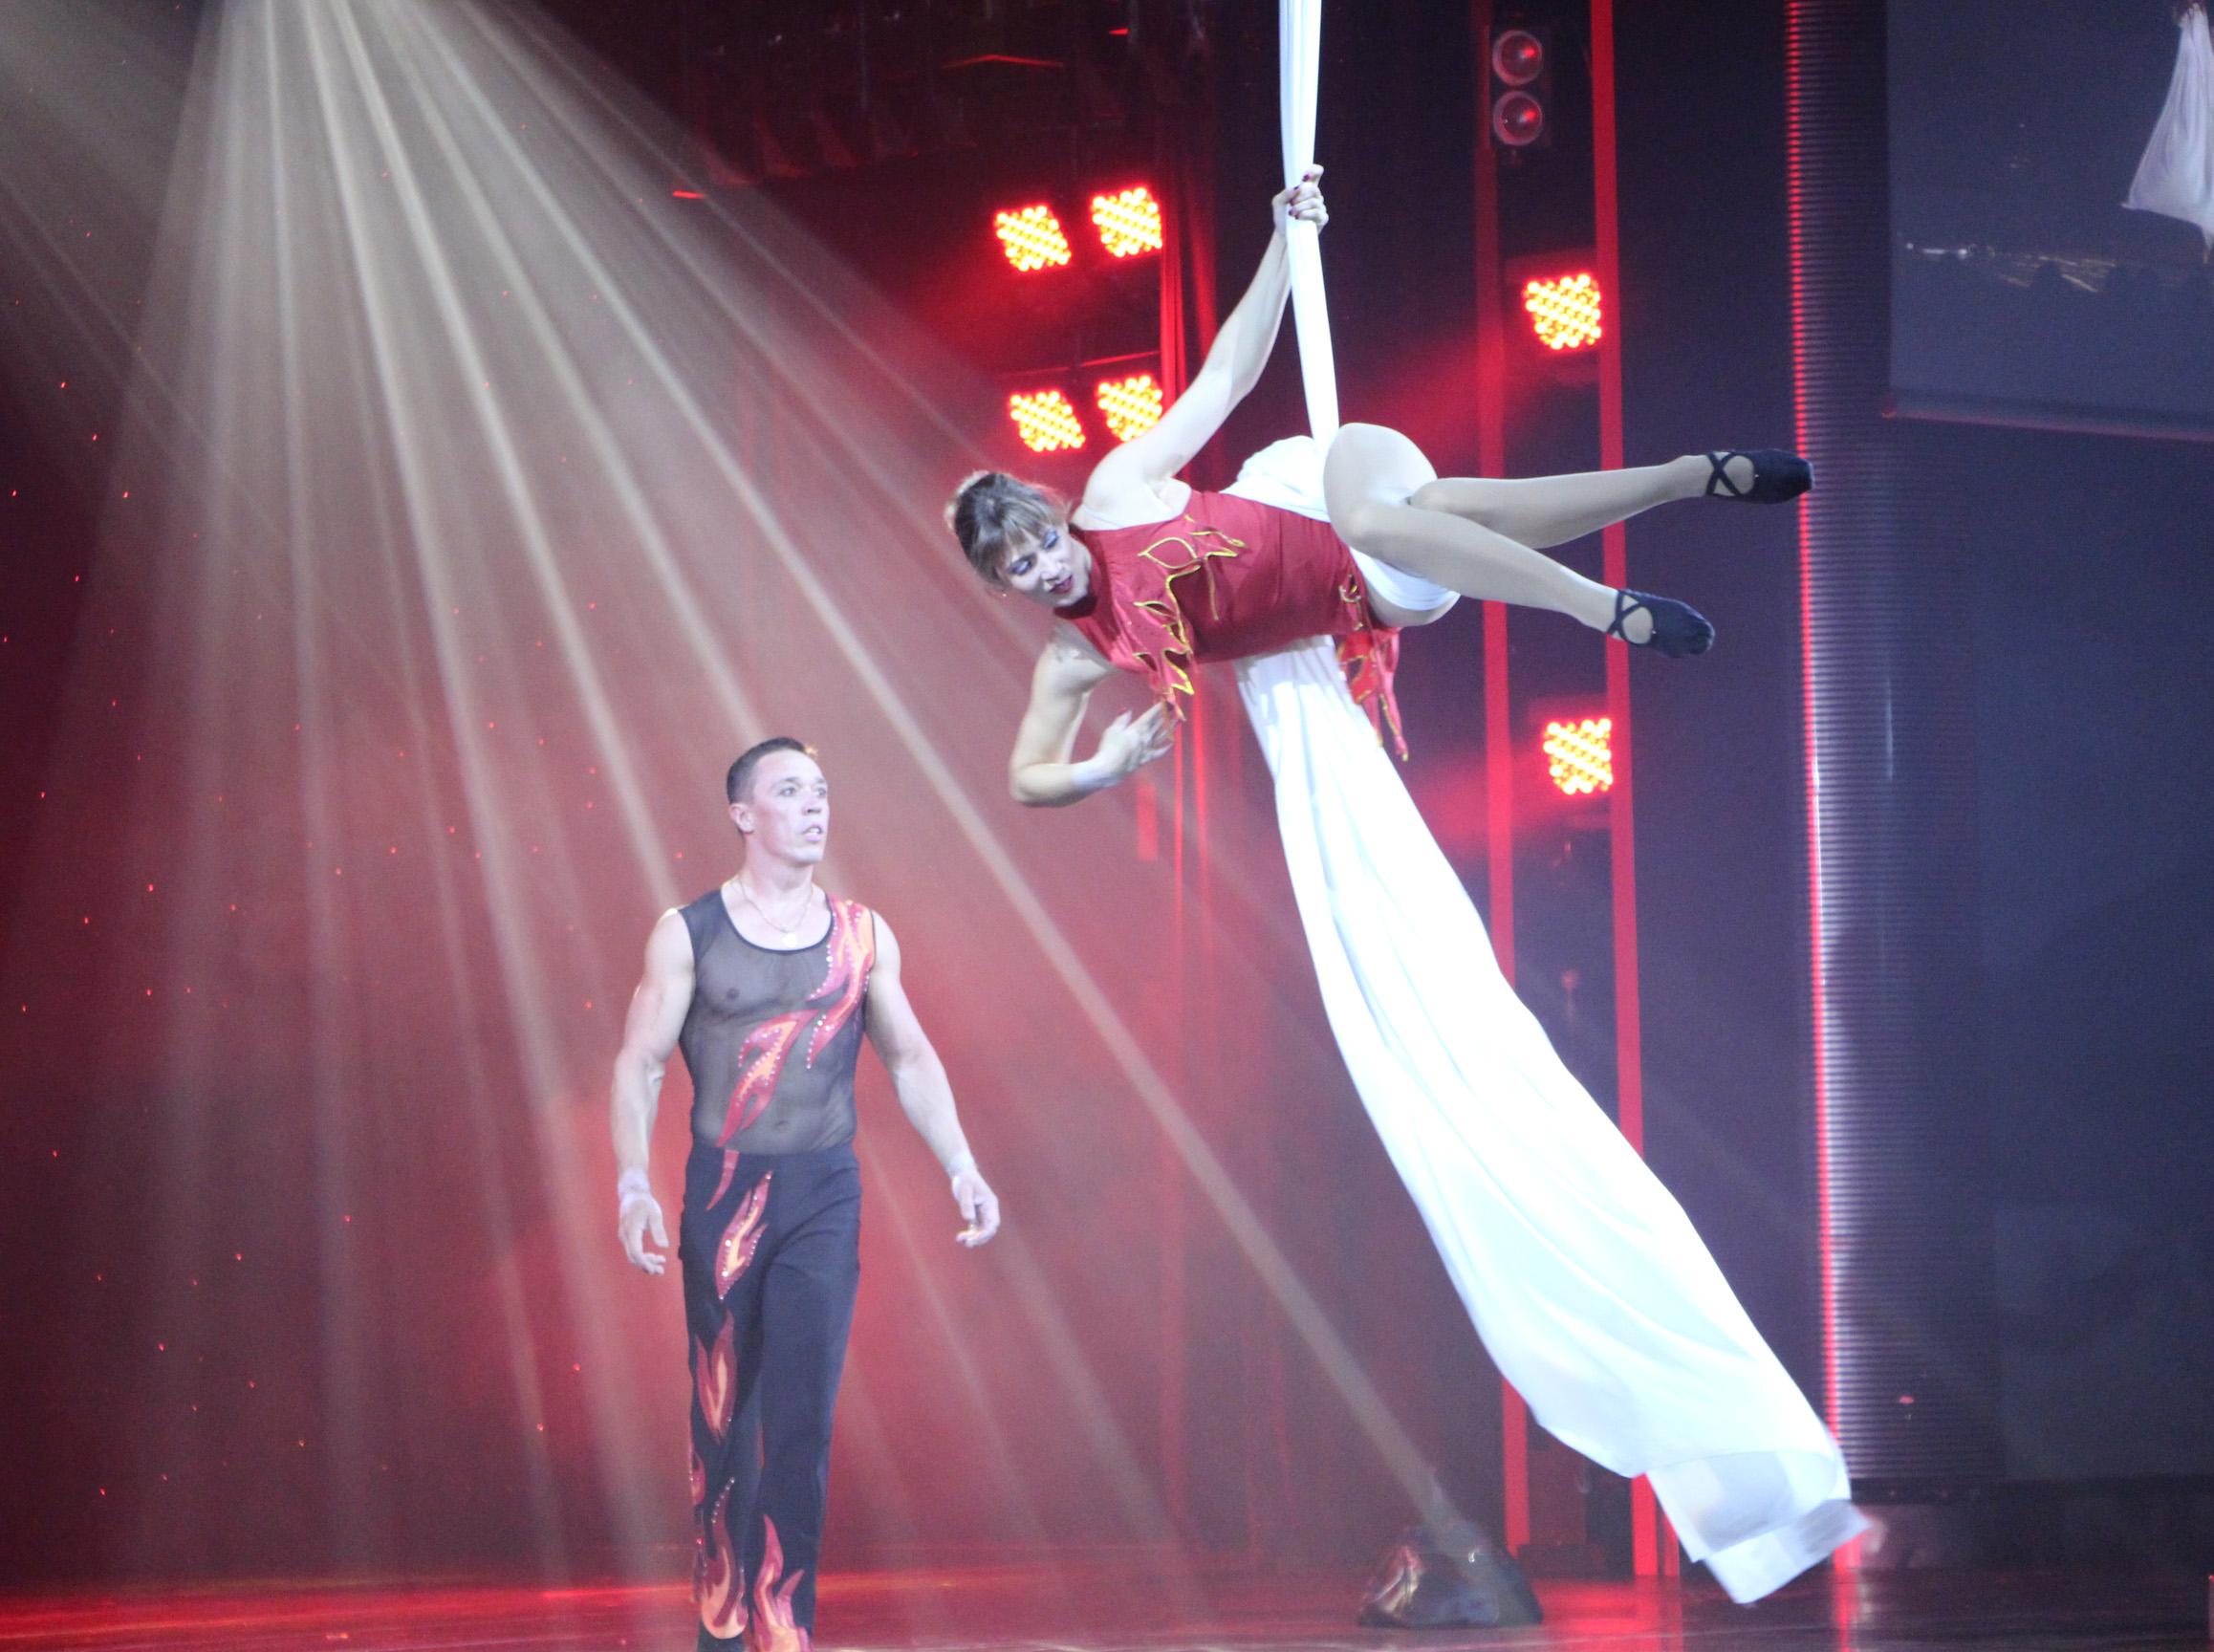 Aerial acrobats on the silks